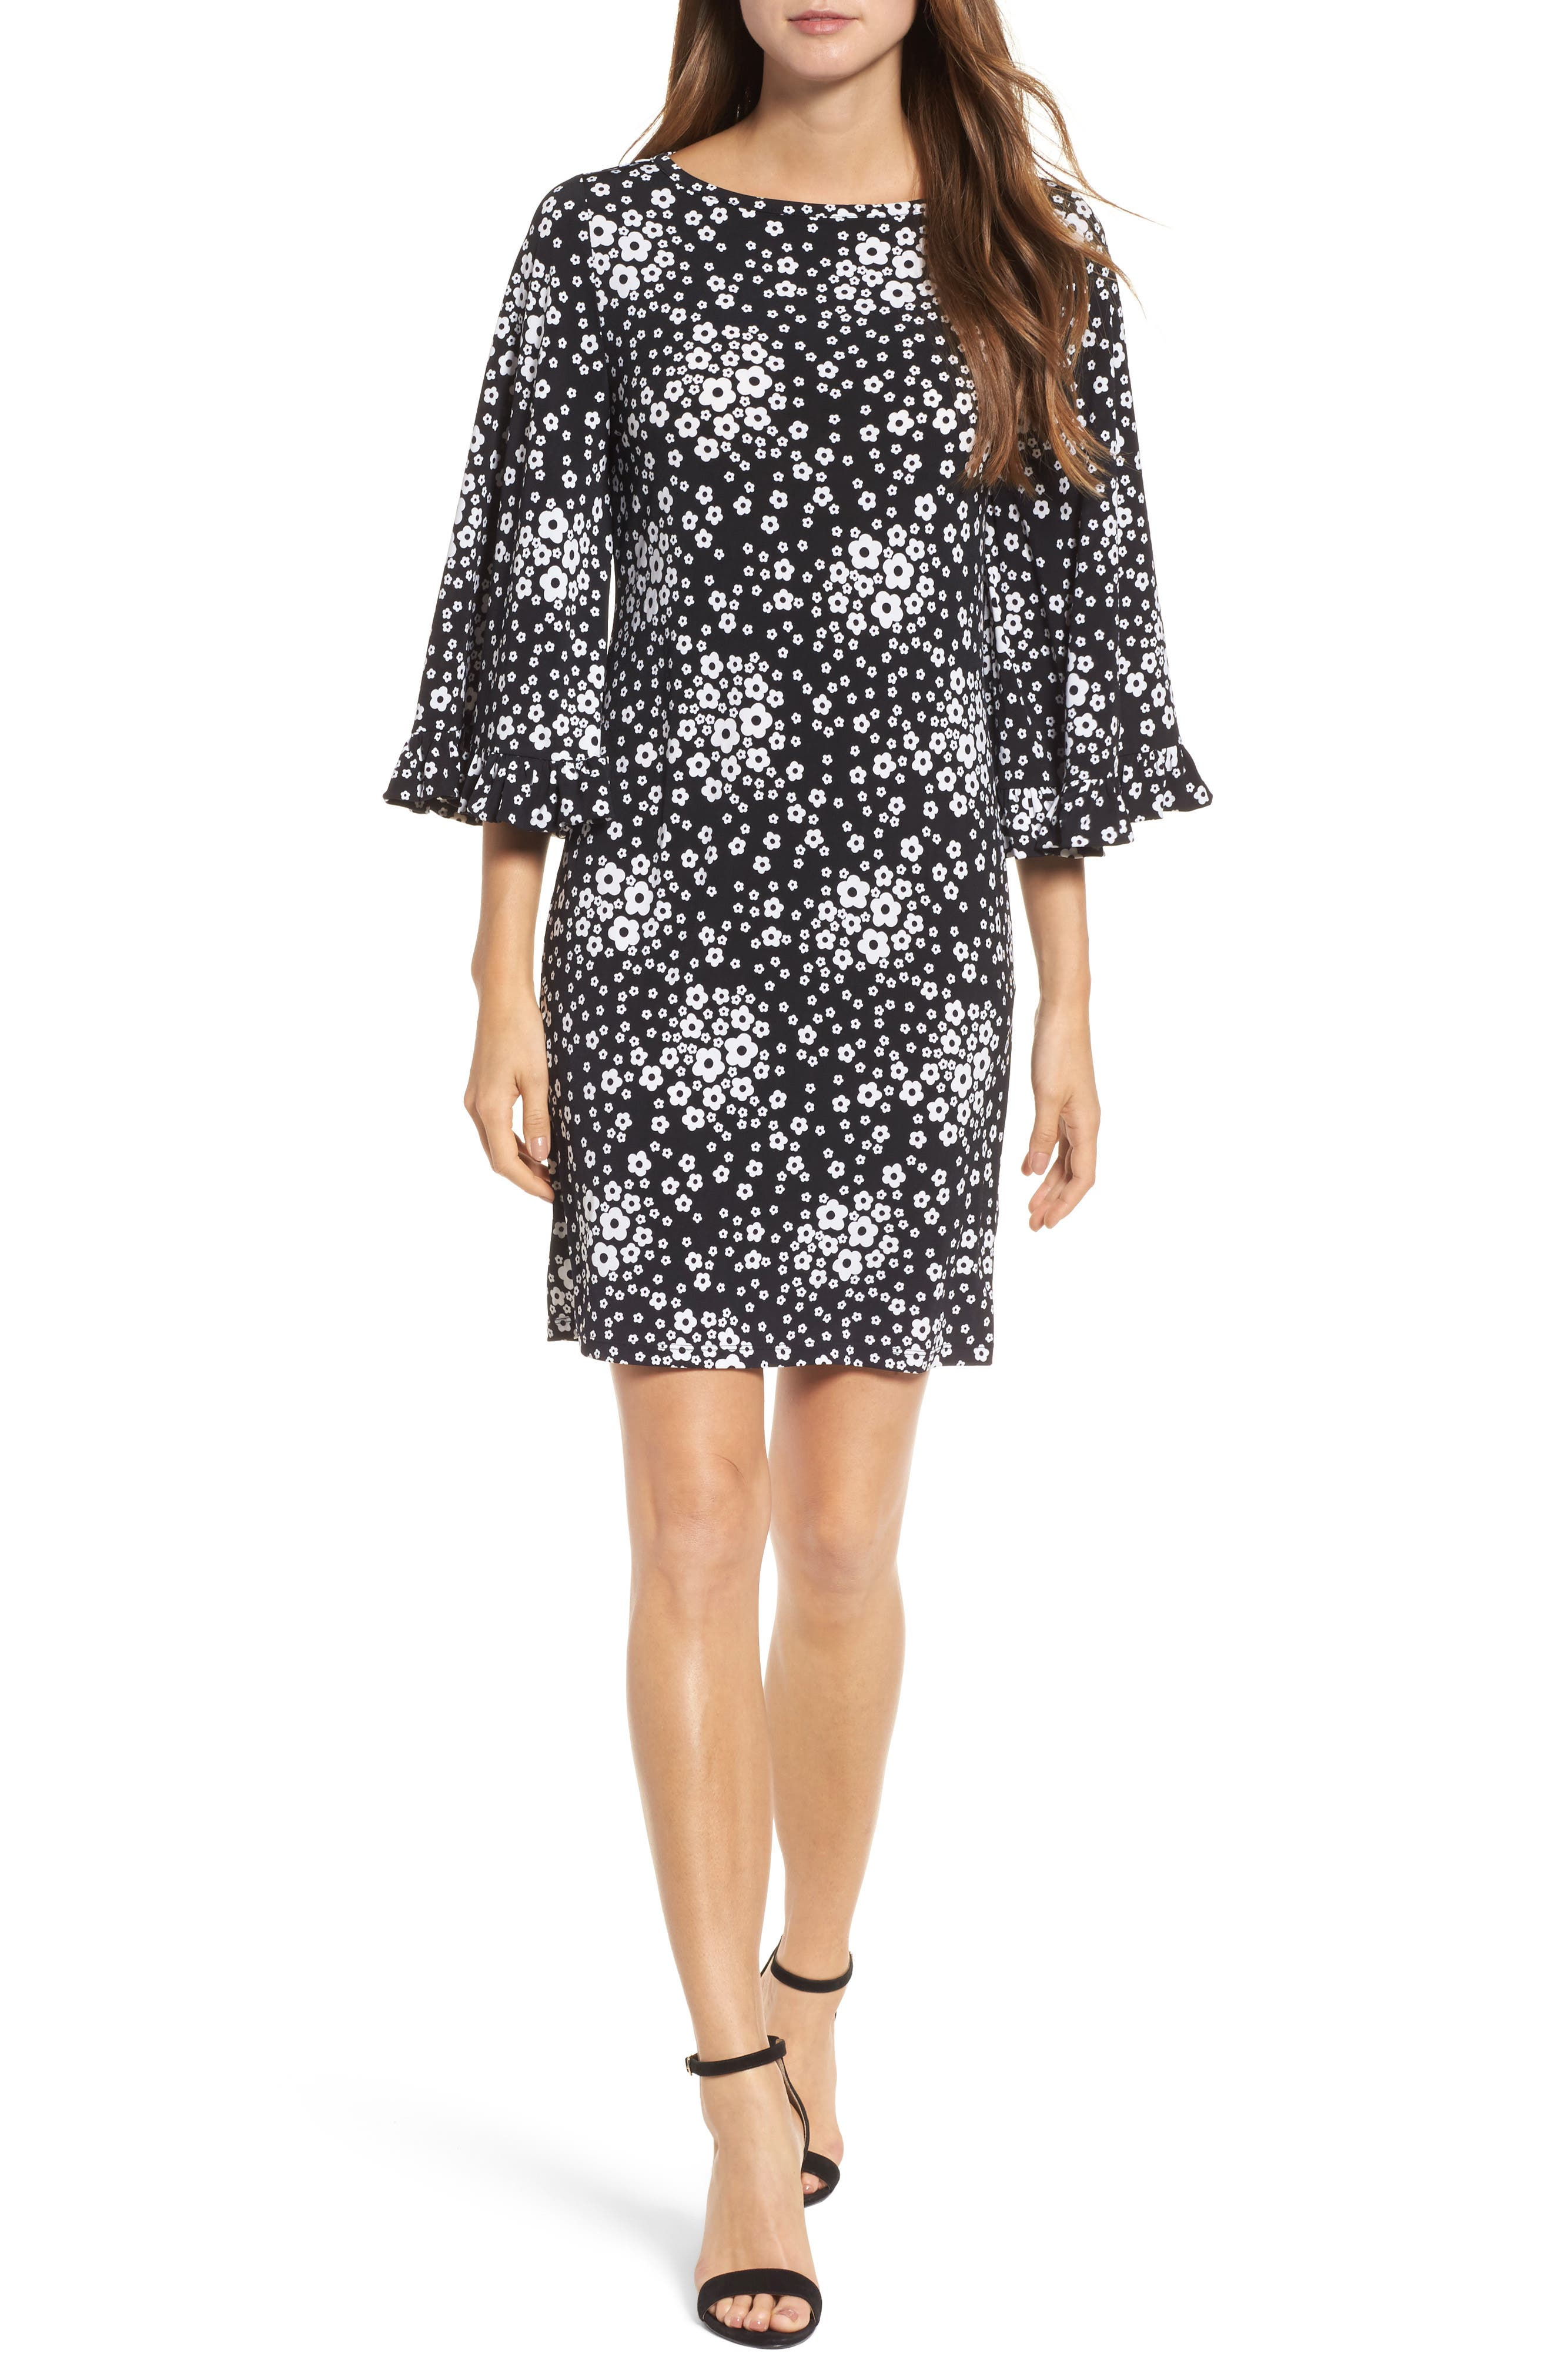 Floral Mod Shift Dress,                         Main,                         color, Black/ White